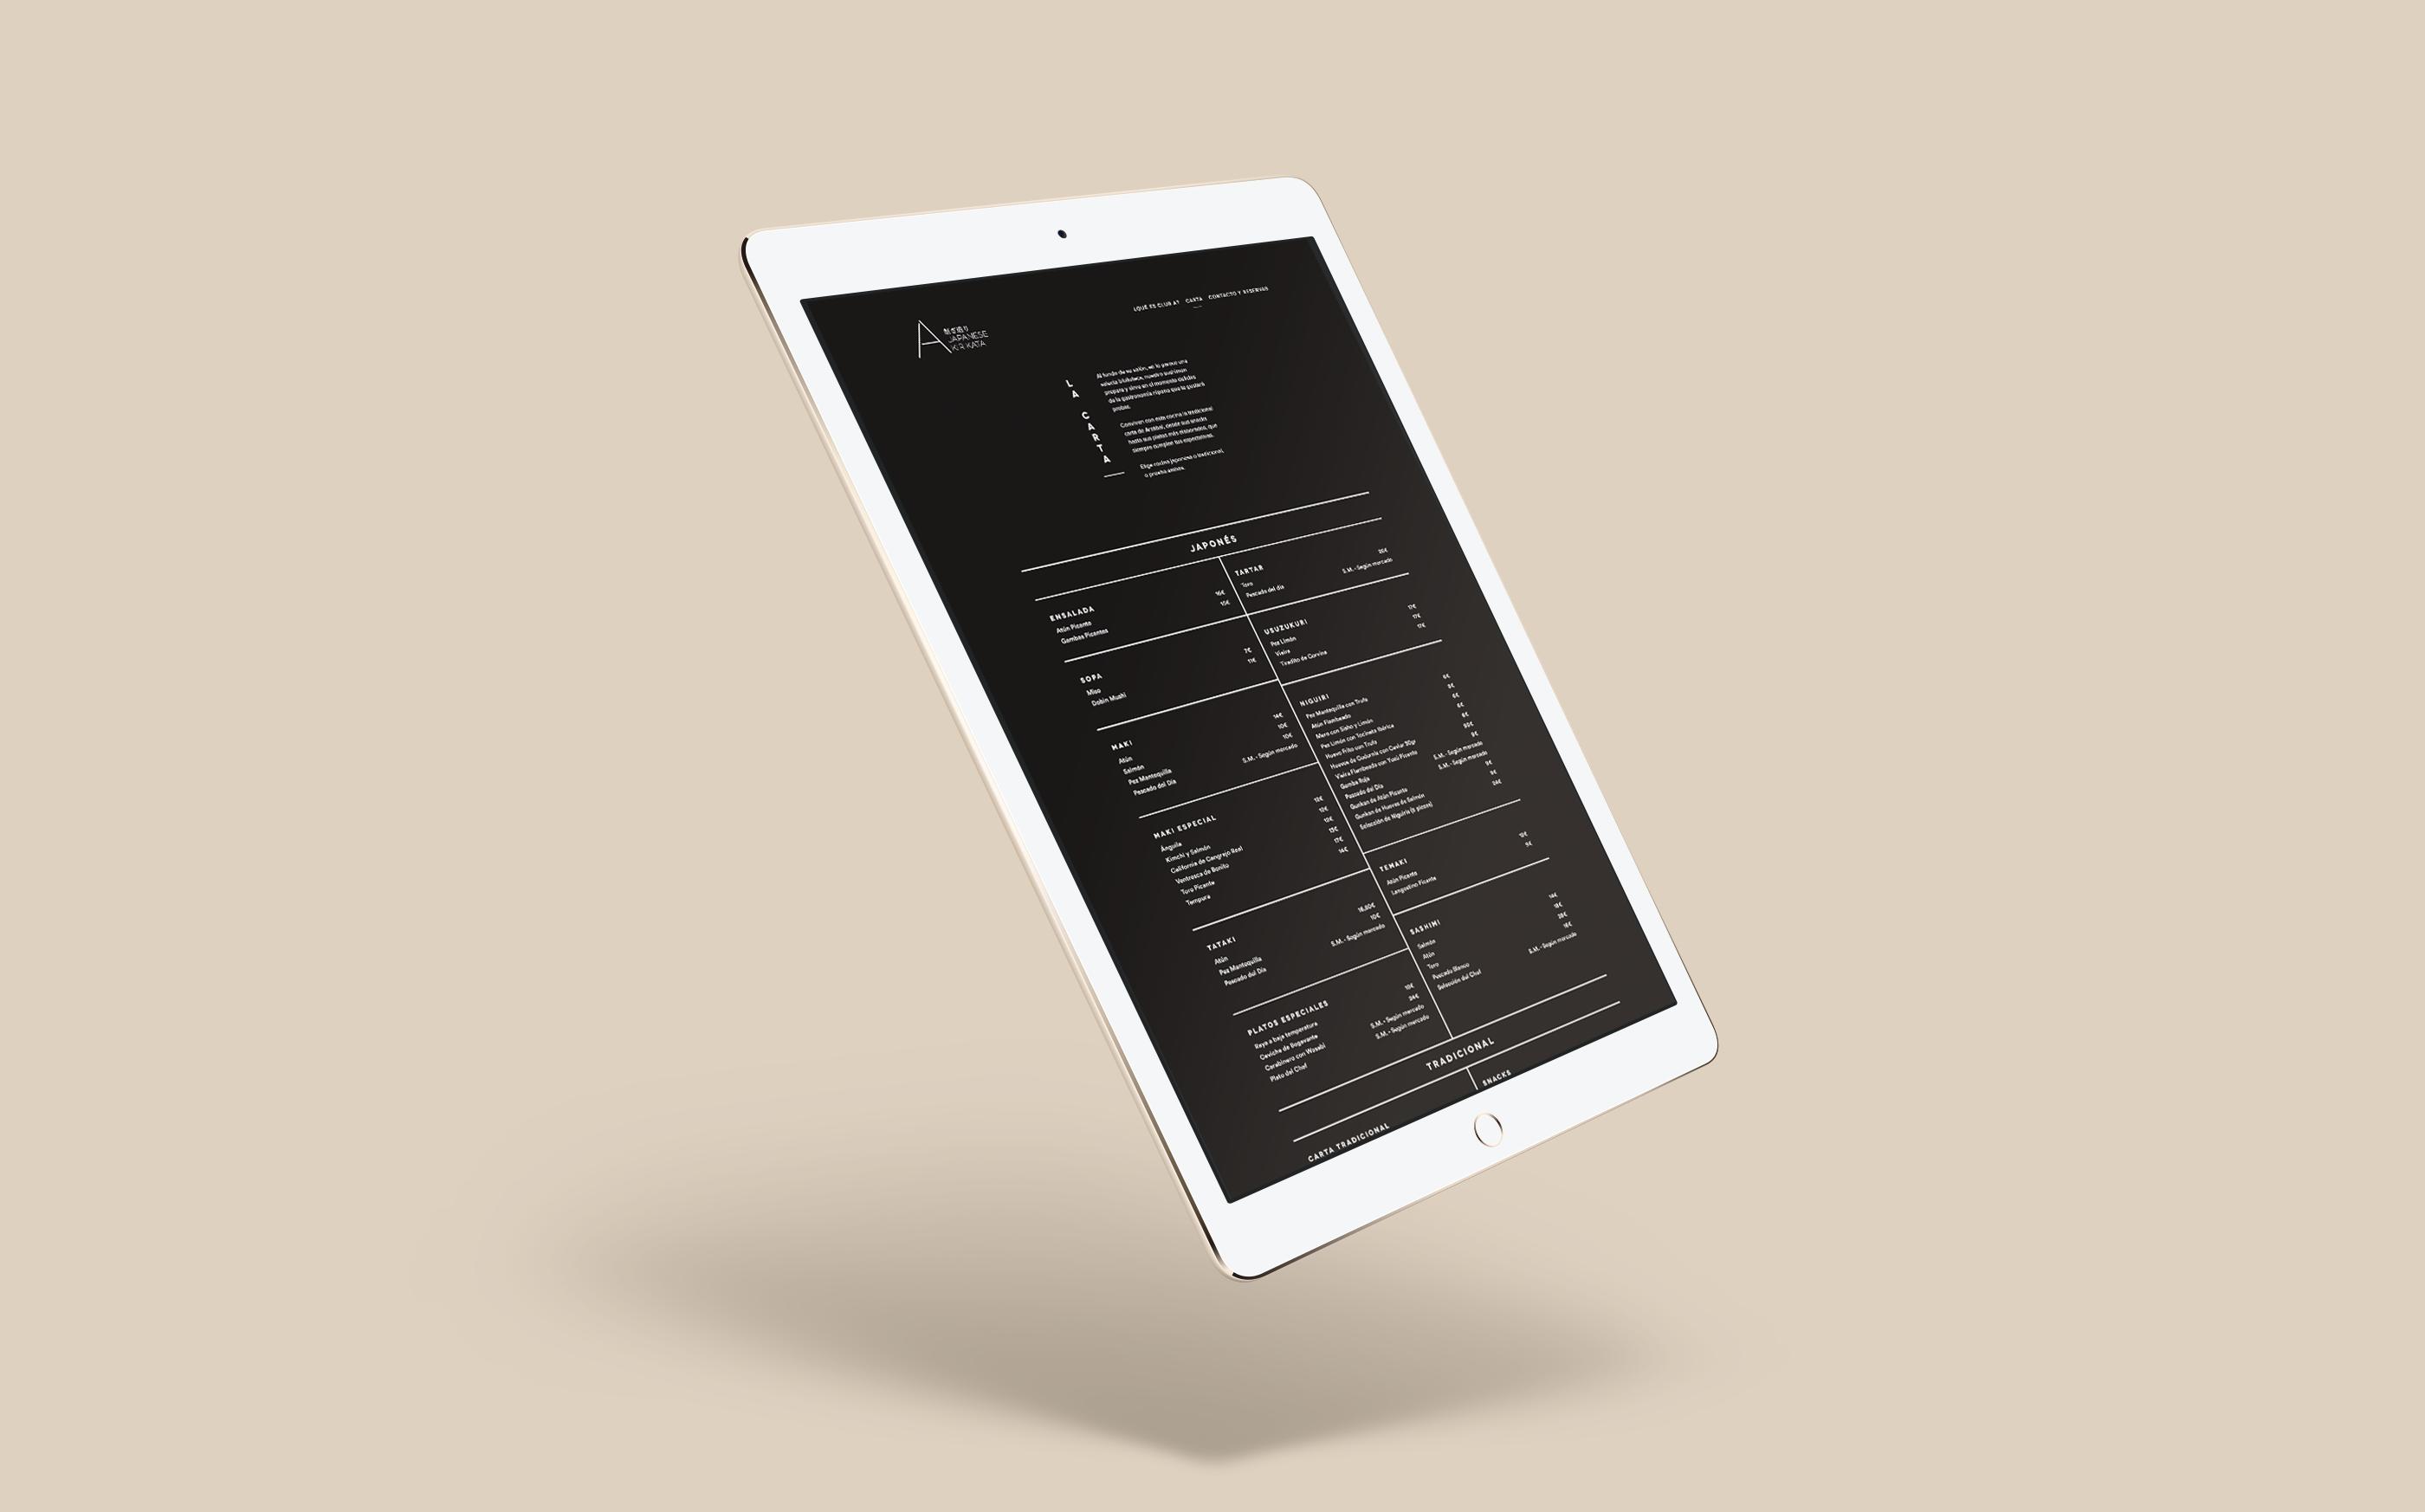 A de Arzábal Japanese Kirikata Web Design by The Woork Co